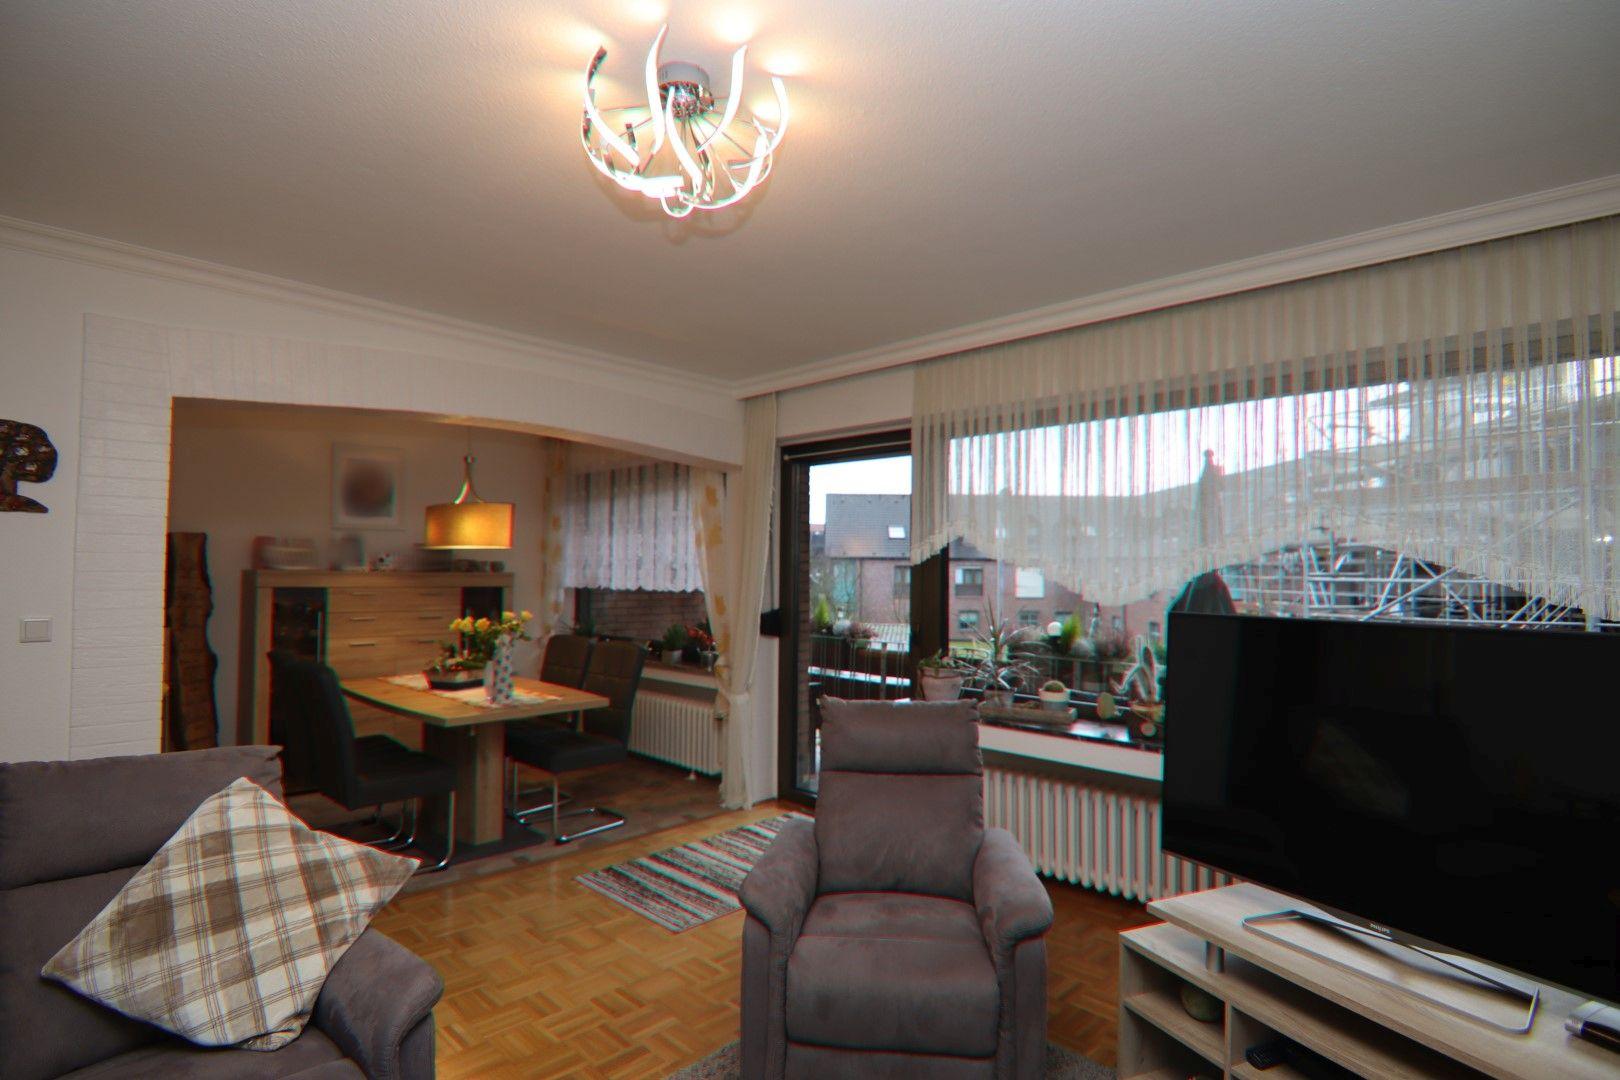 Immobilie Nr.0286 | Hauptstraße 60, 40668 Meerbusch Lank